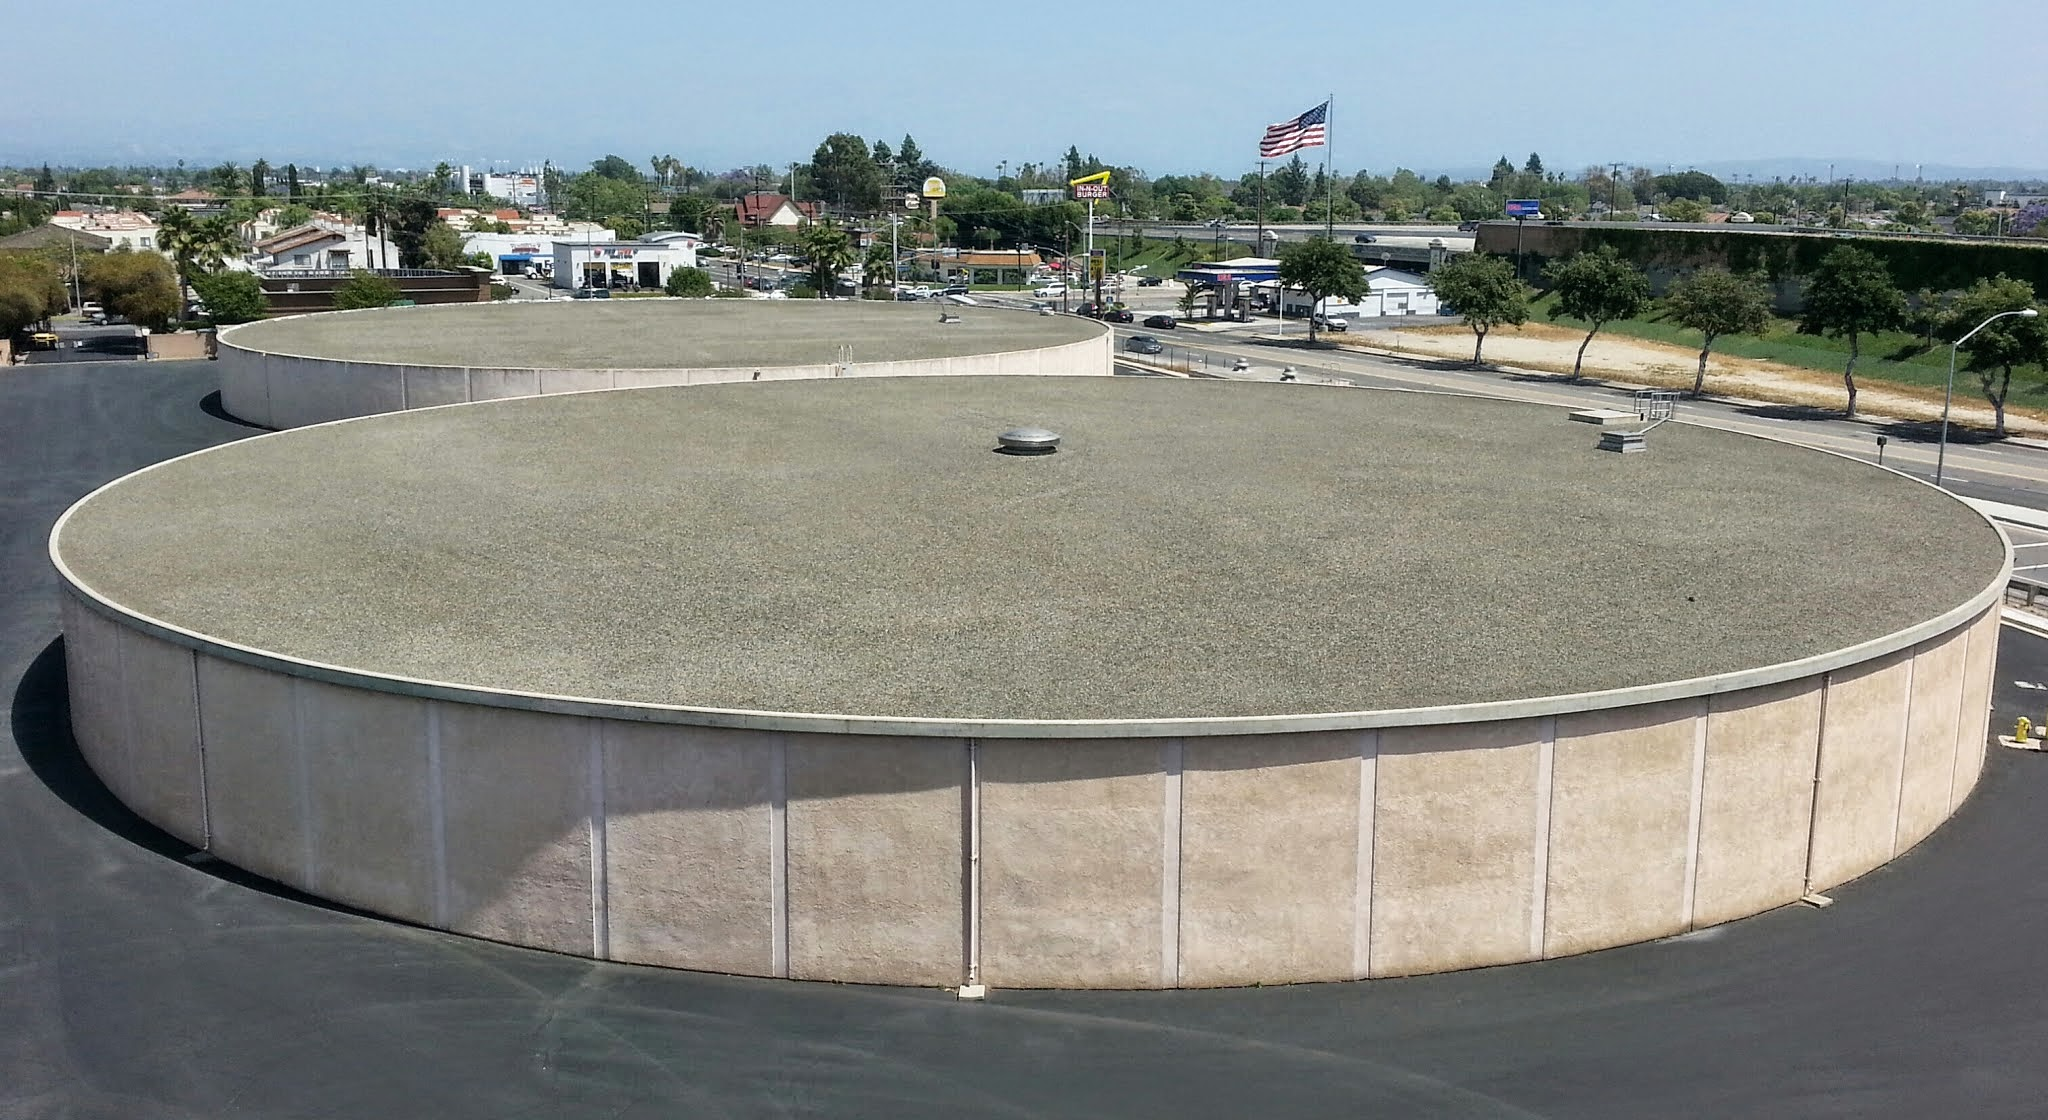 Photo of a Storage Tank